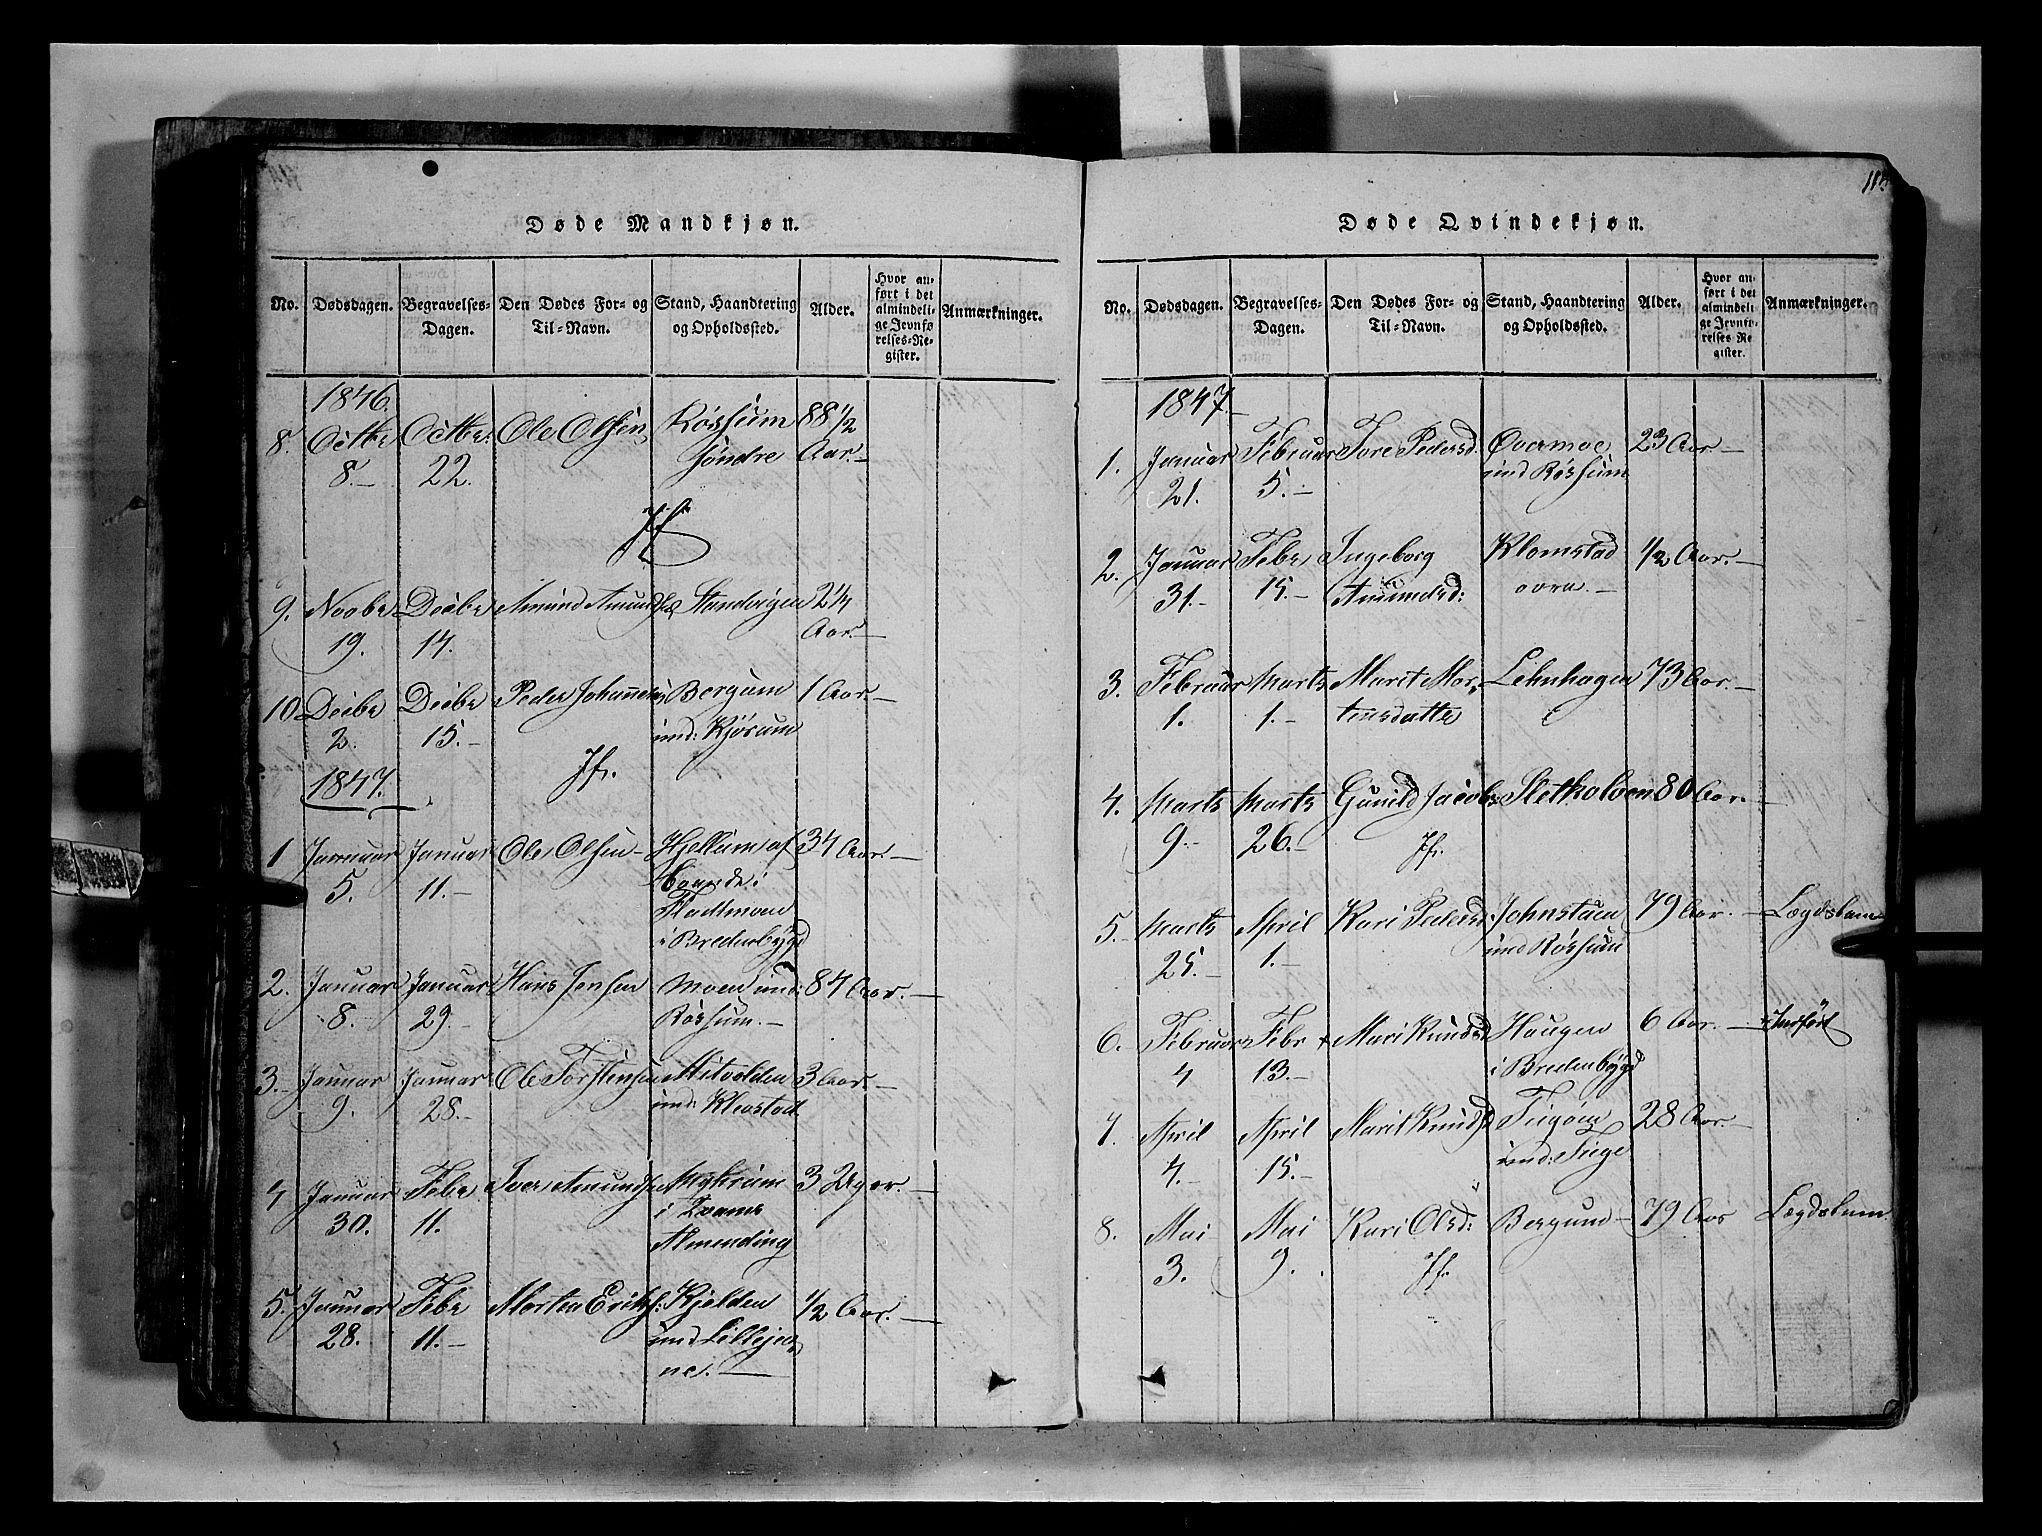 SAH, Fron prestekontor, H/Ha/Hab/L0002: Klokkerbok nr. 2, 1816-1850, s. 115